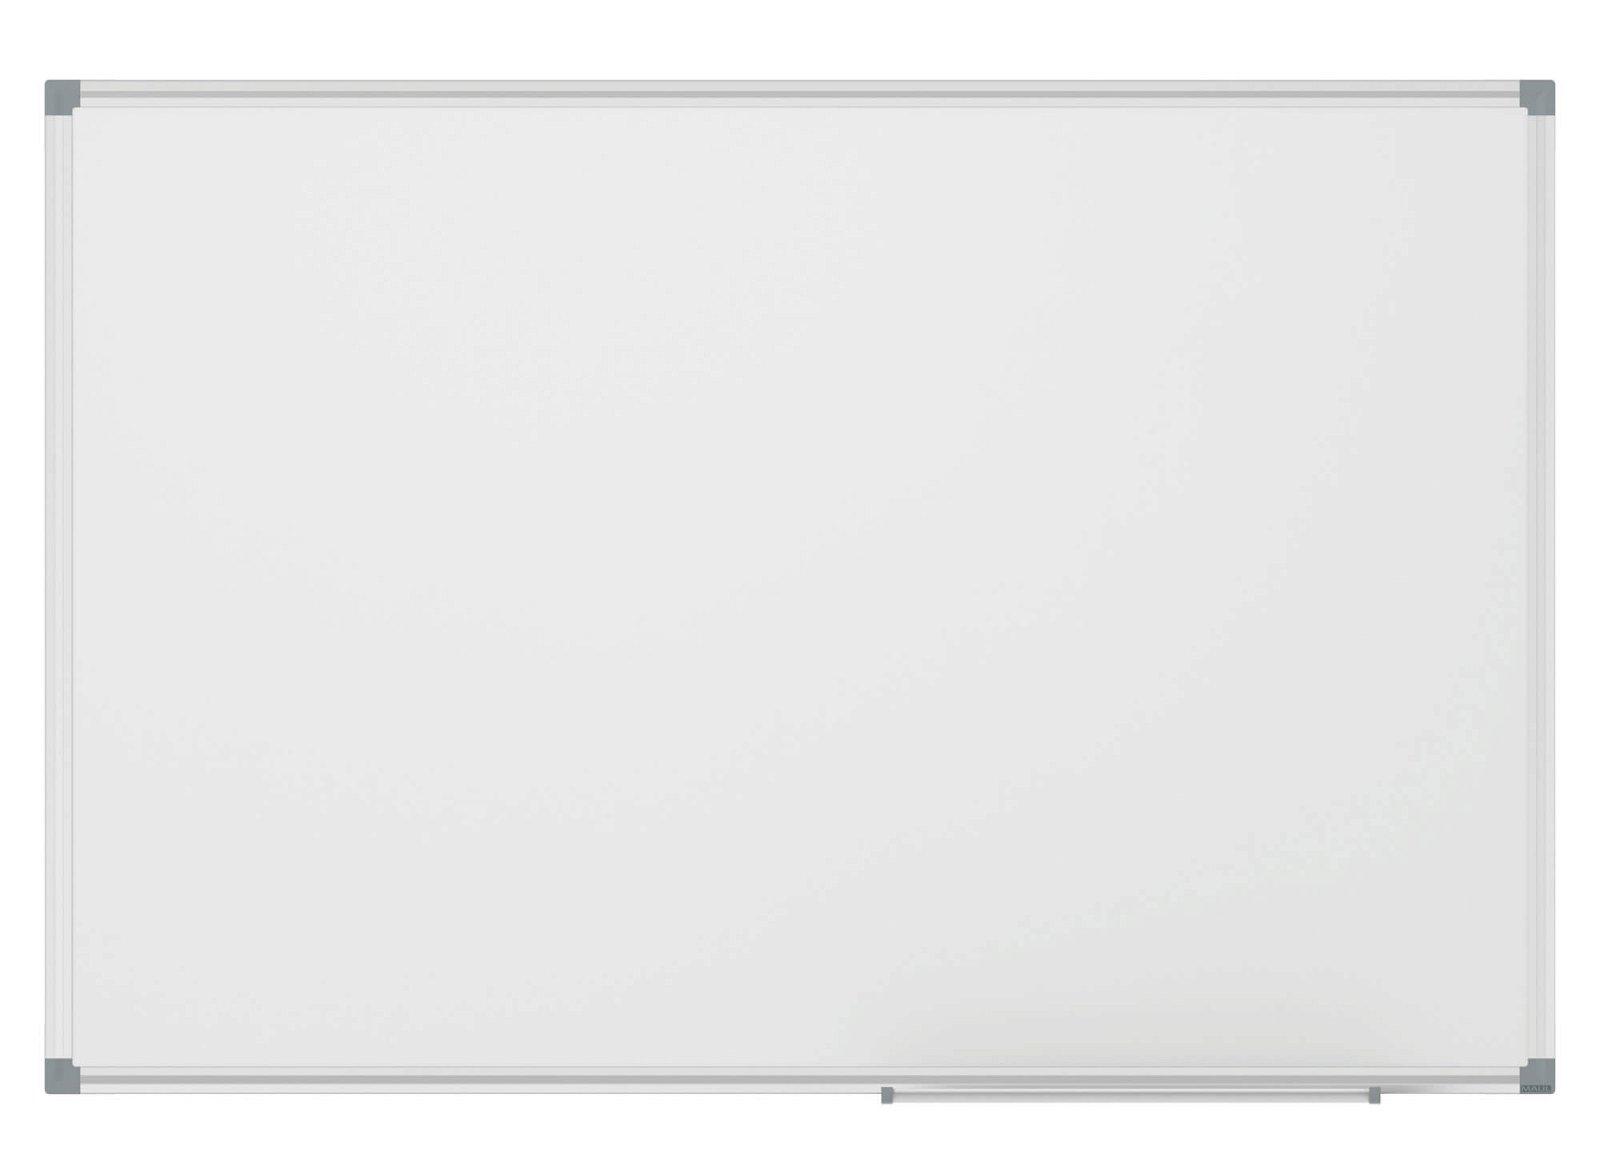 Whiteboard MAULstandard, 120x300 cm, grau